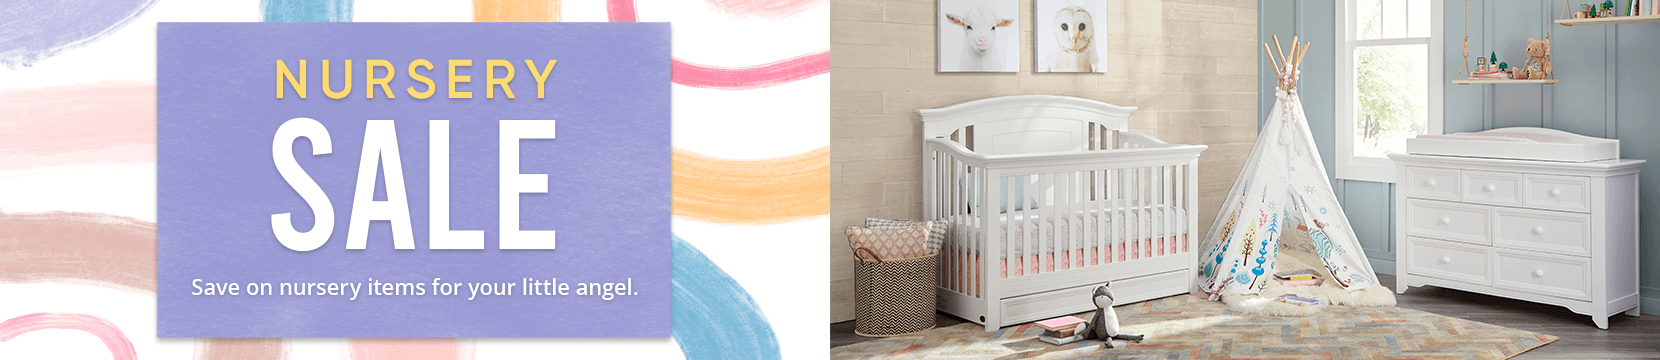 nursery sale. save on nursery items for your little angel